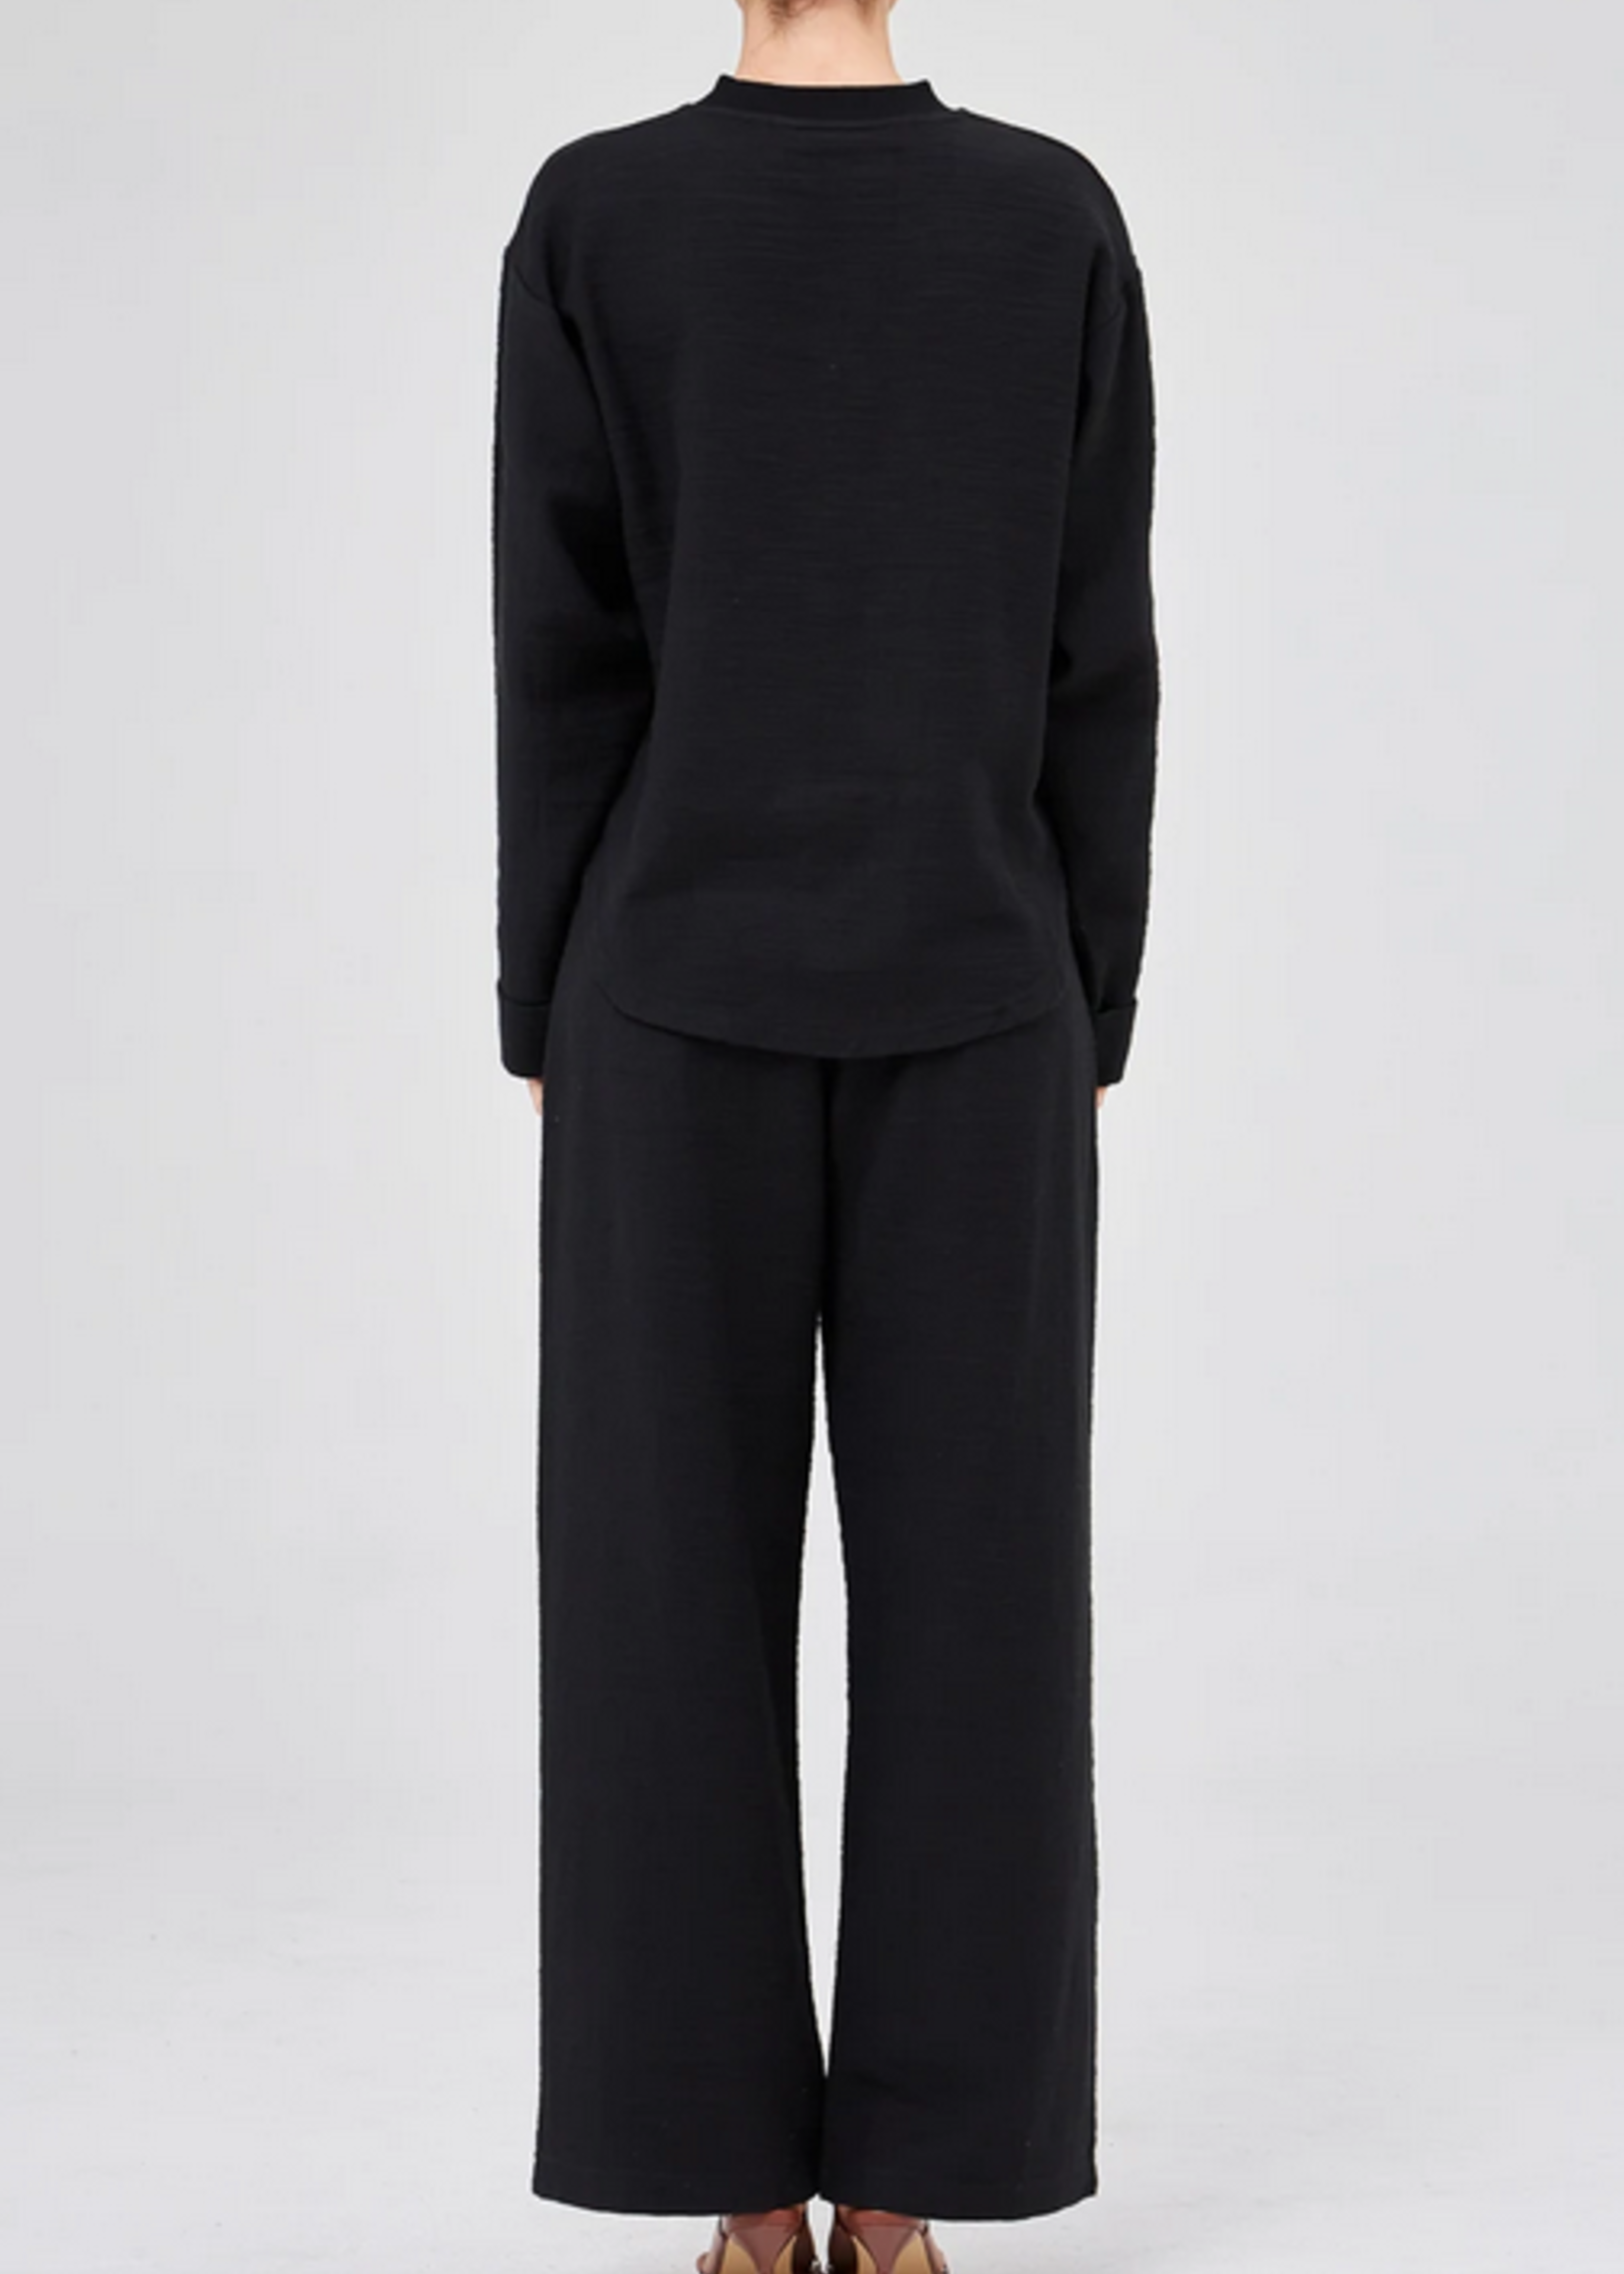 Elitaire Boutique Ivy Top in Black